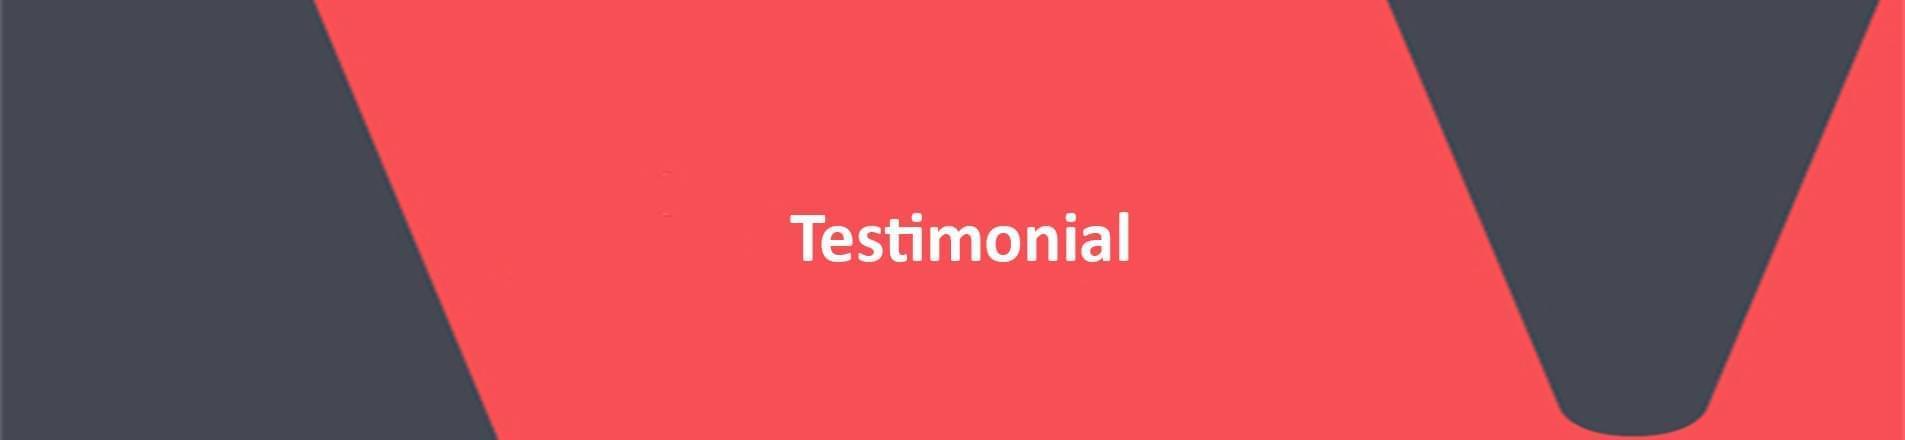 The word Testimonial on VERCIDA branded background